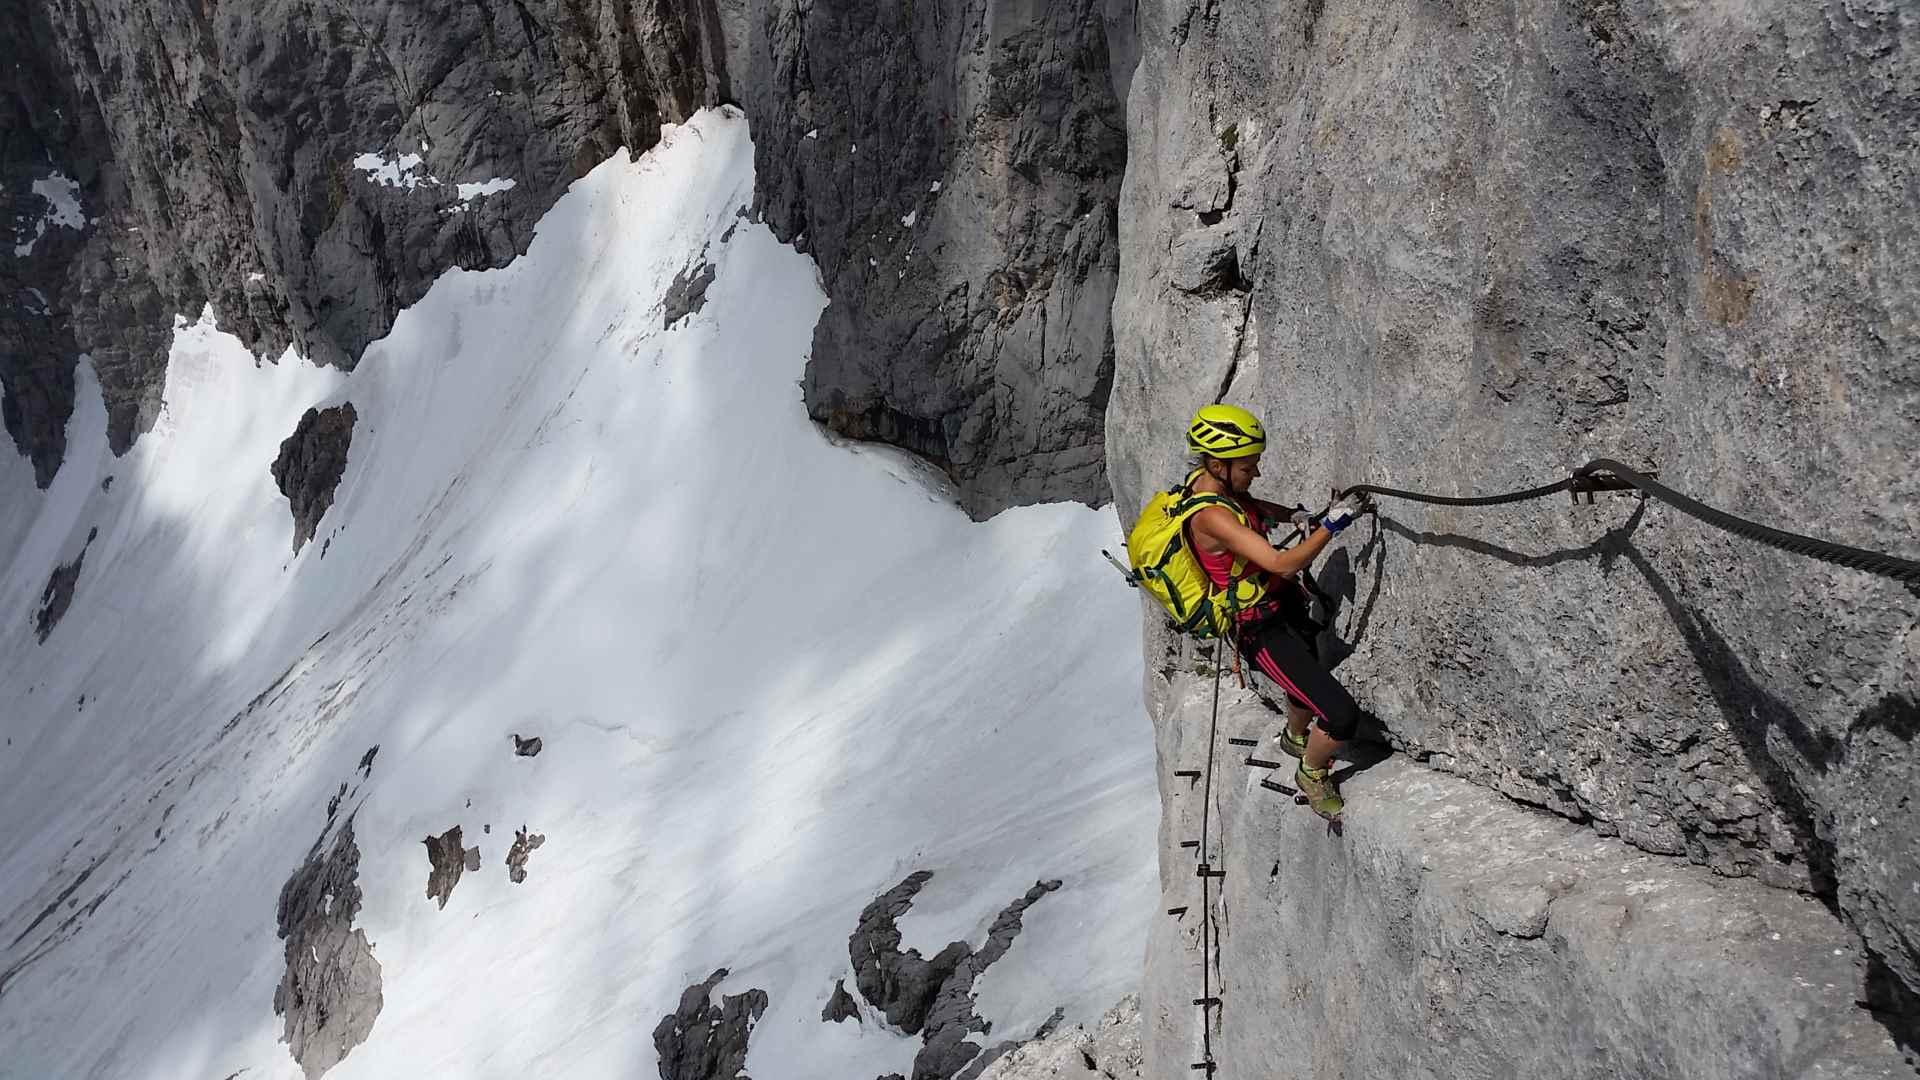 Klettersteig Zahme Gams : Klettersteige bei lofer